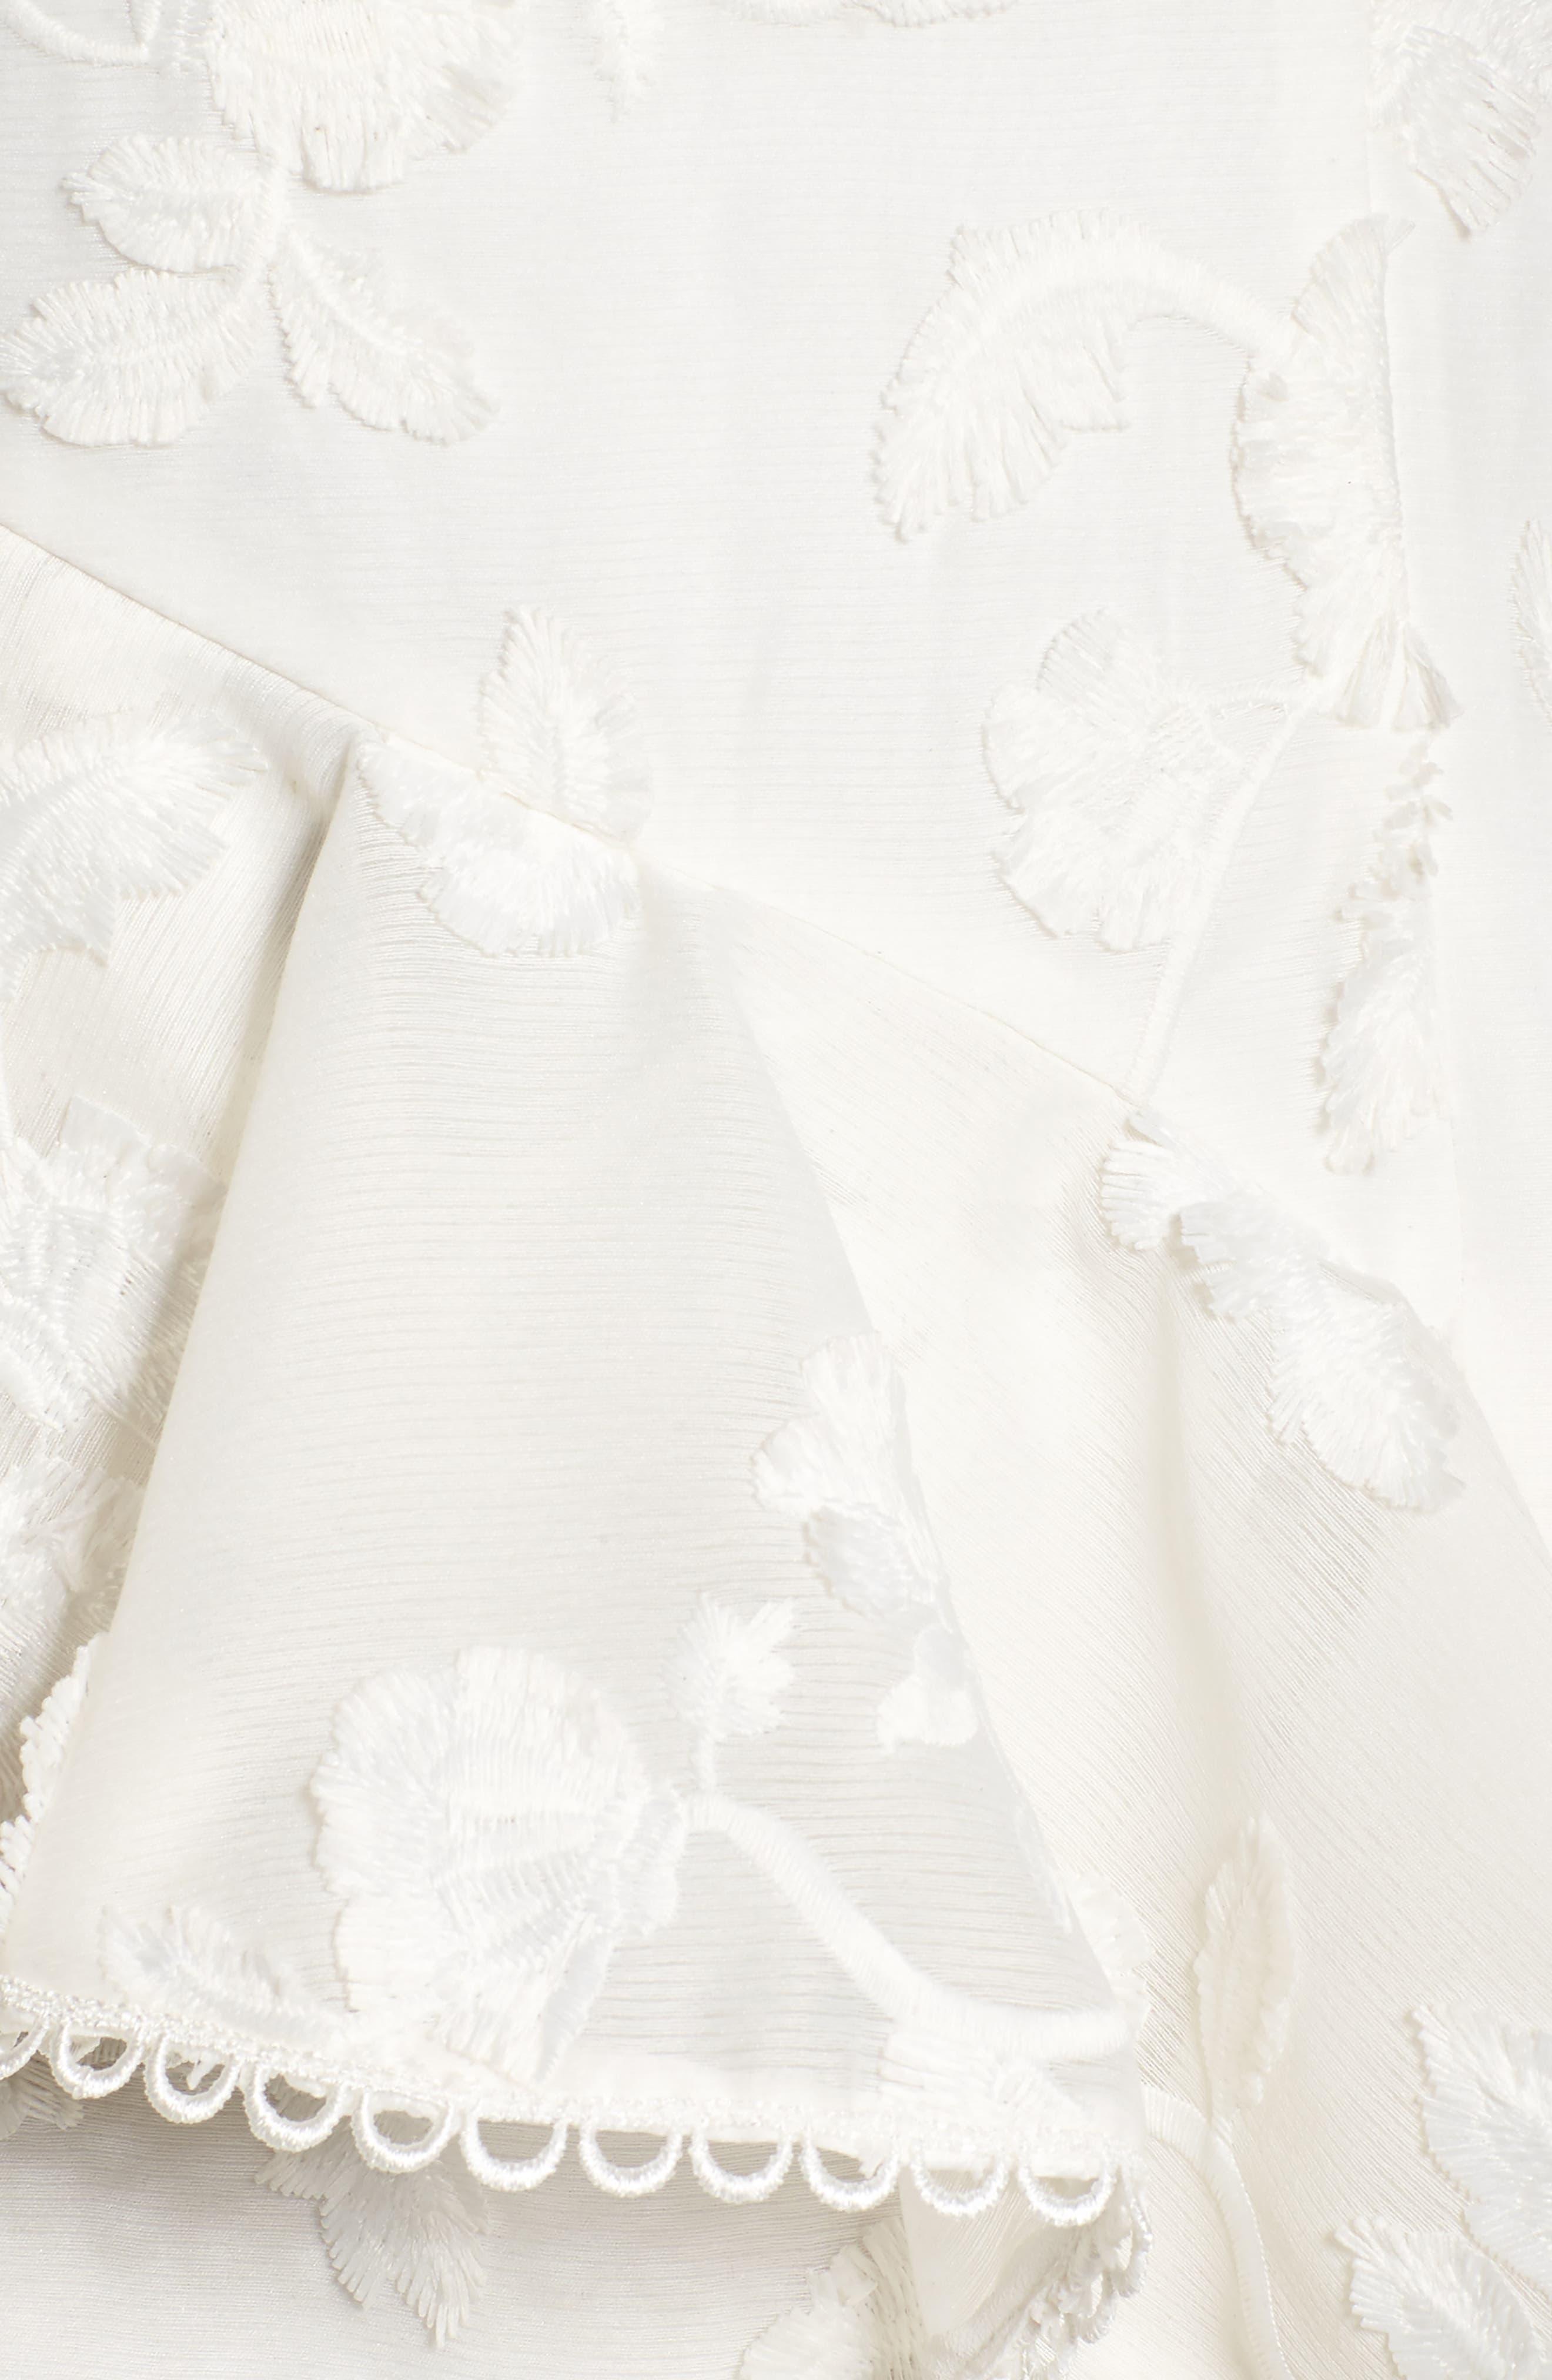 Shine Ruffle Lace Tea Length Dress,                             Alternate thumbnail 5, color,                             Ivory